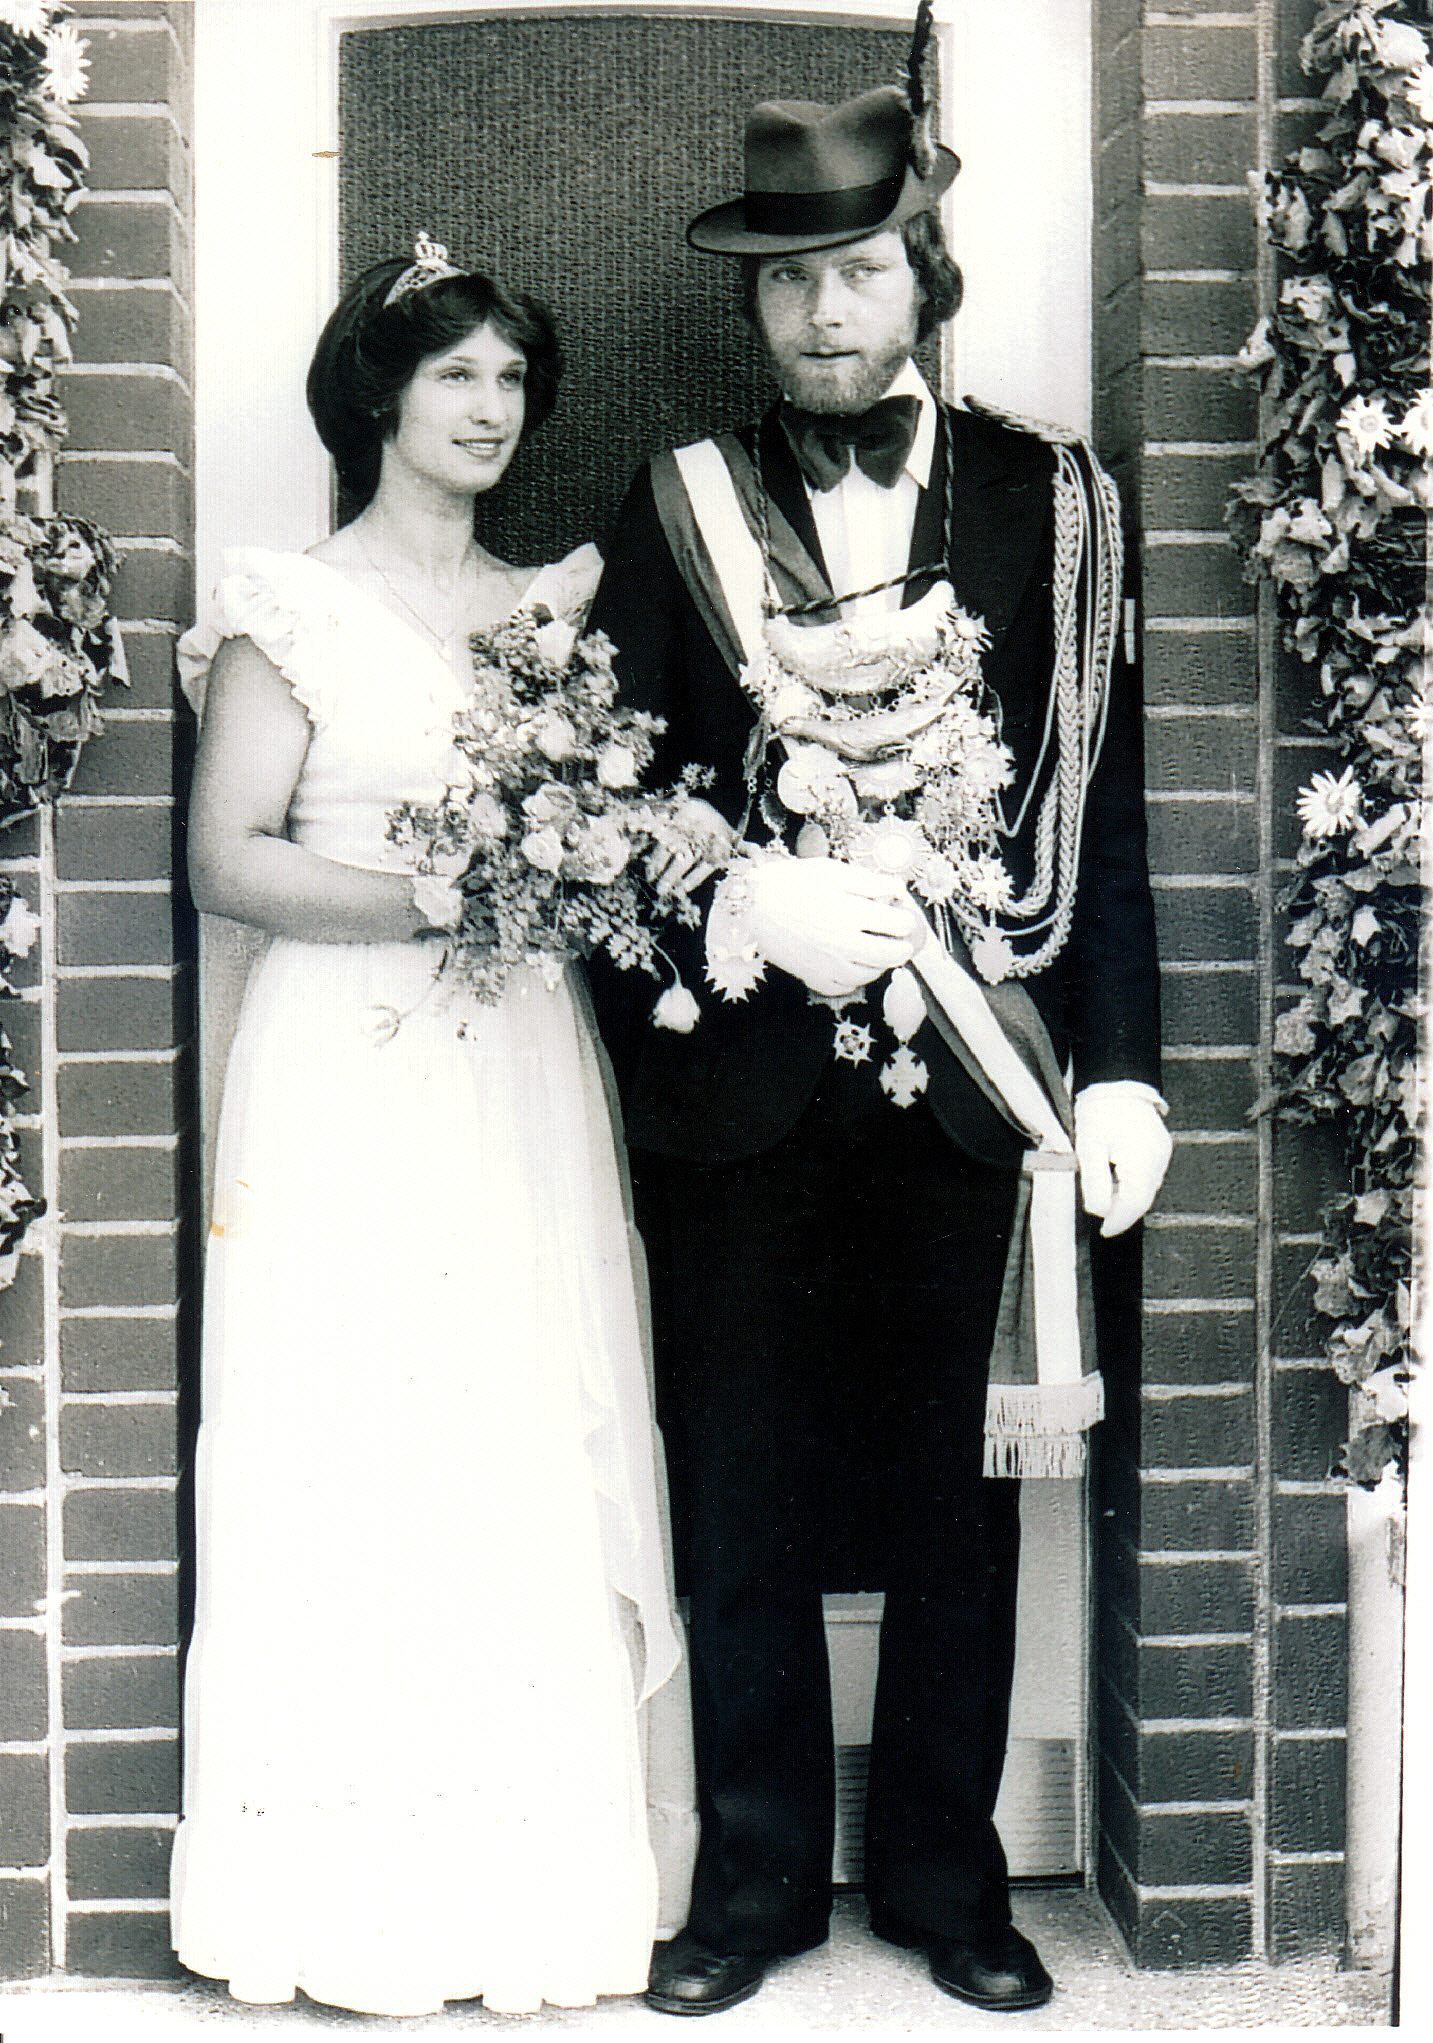 1977 Heinz Finkeldei+ & Gisela Becker